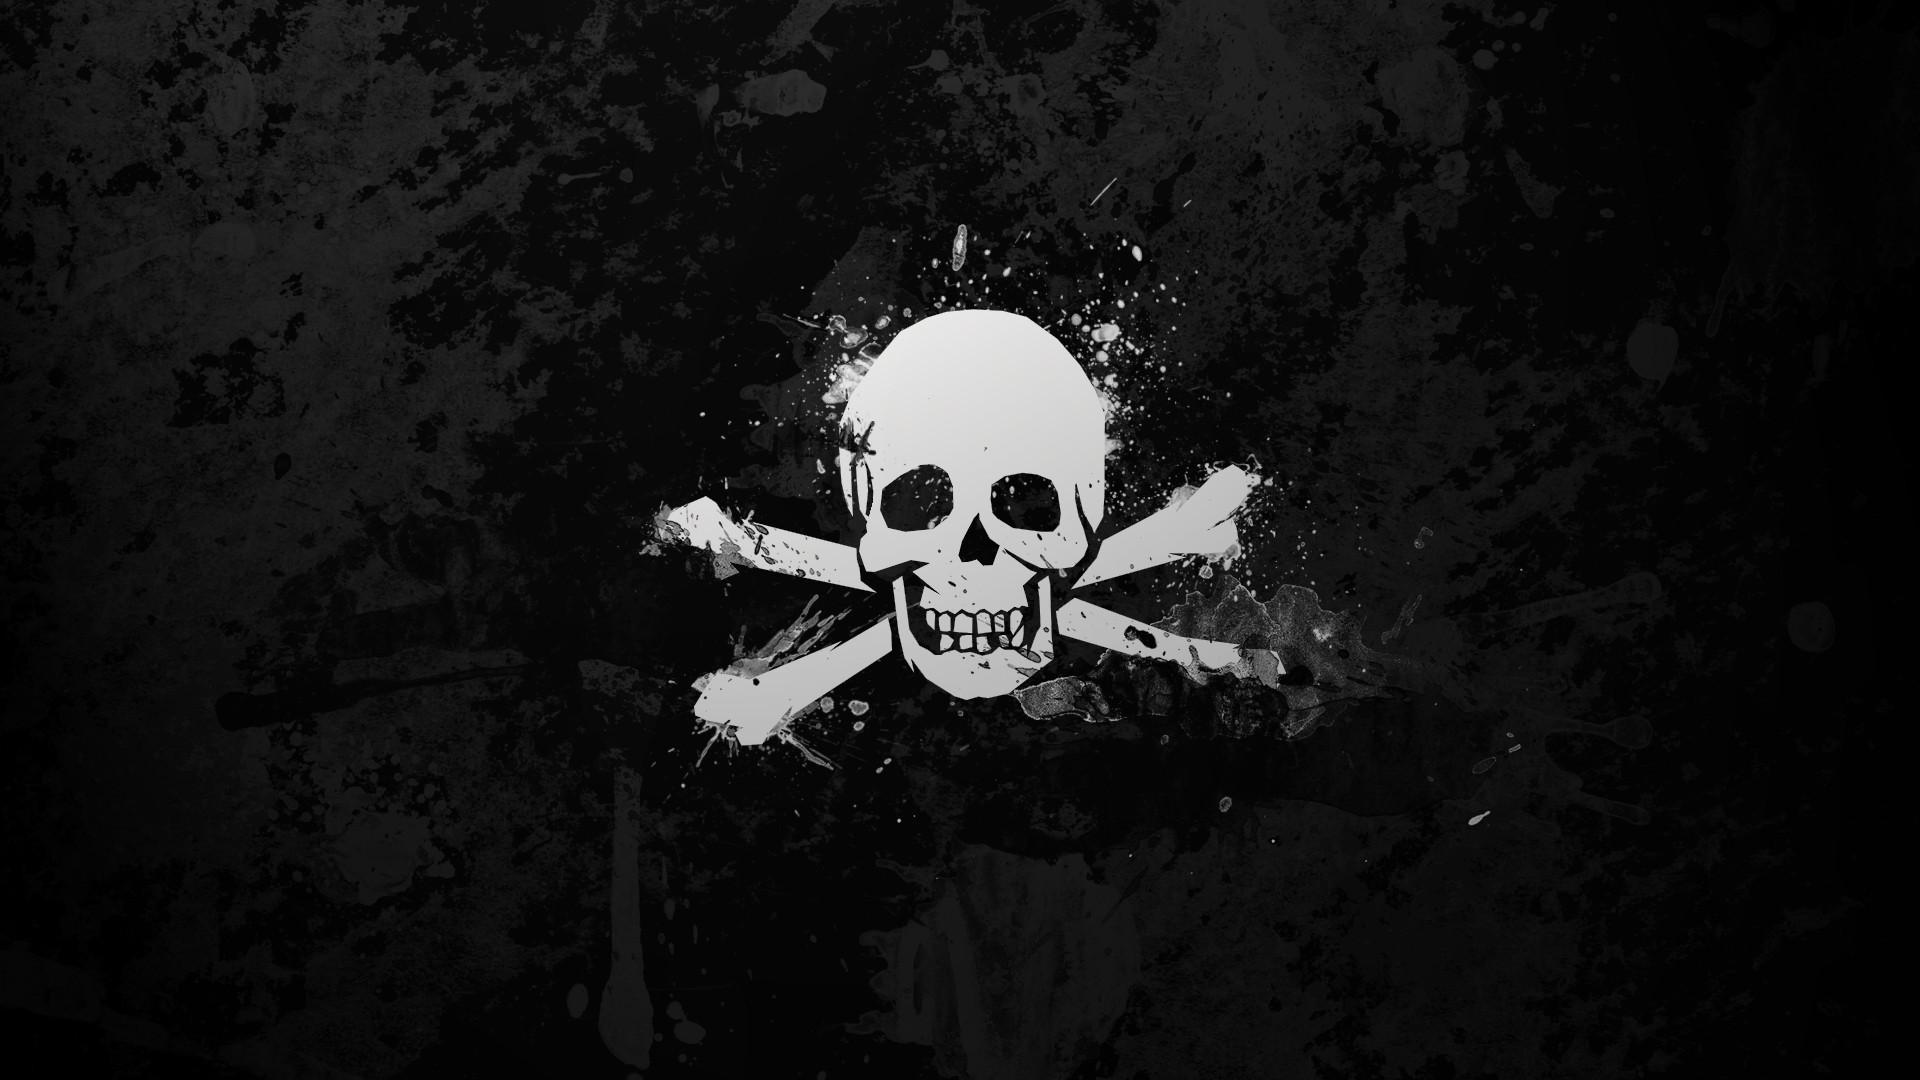 Room Of Death HD desktop wallpaper High Definition Fullscreen